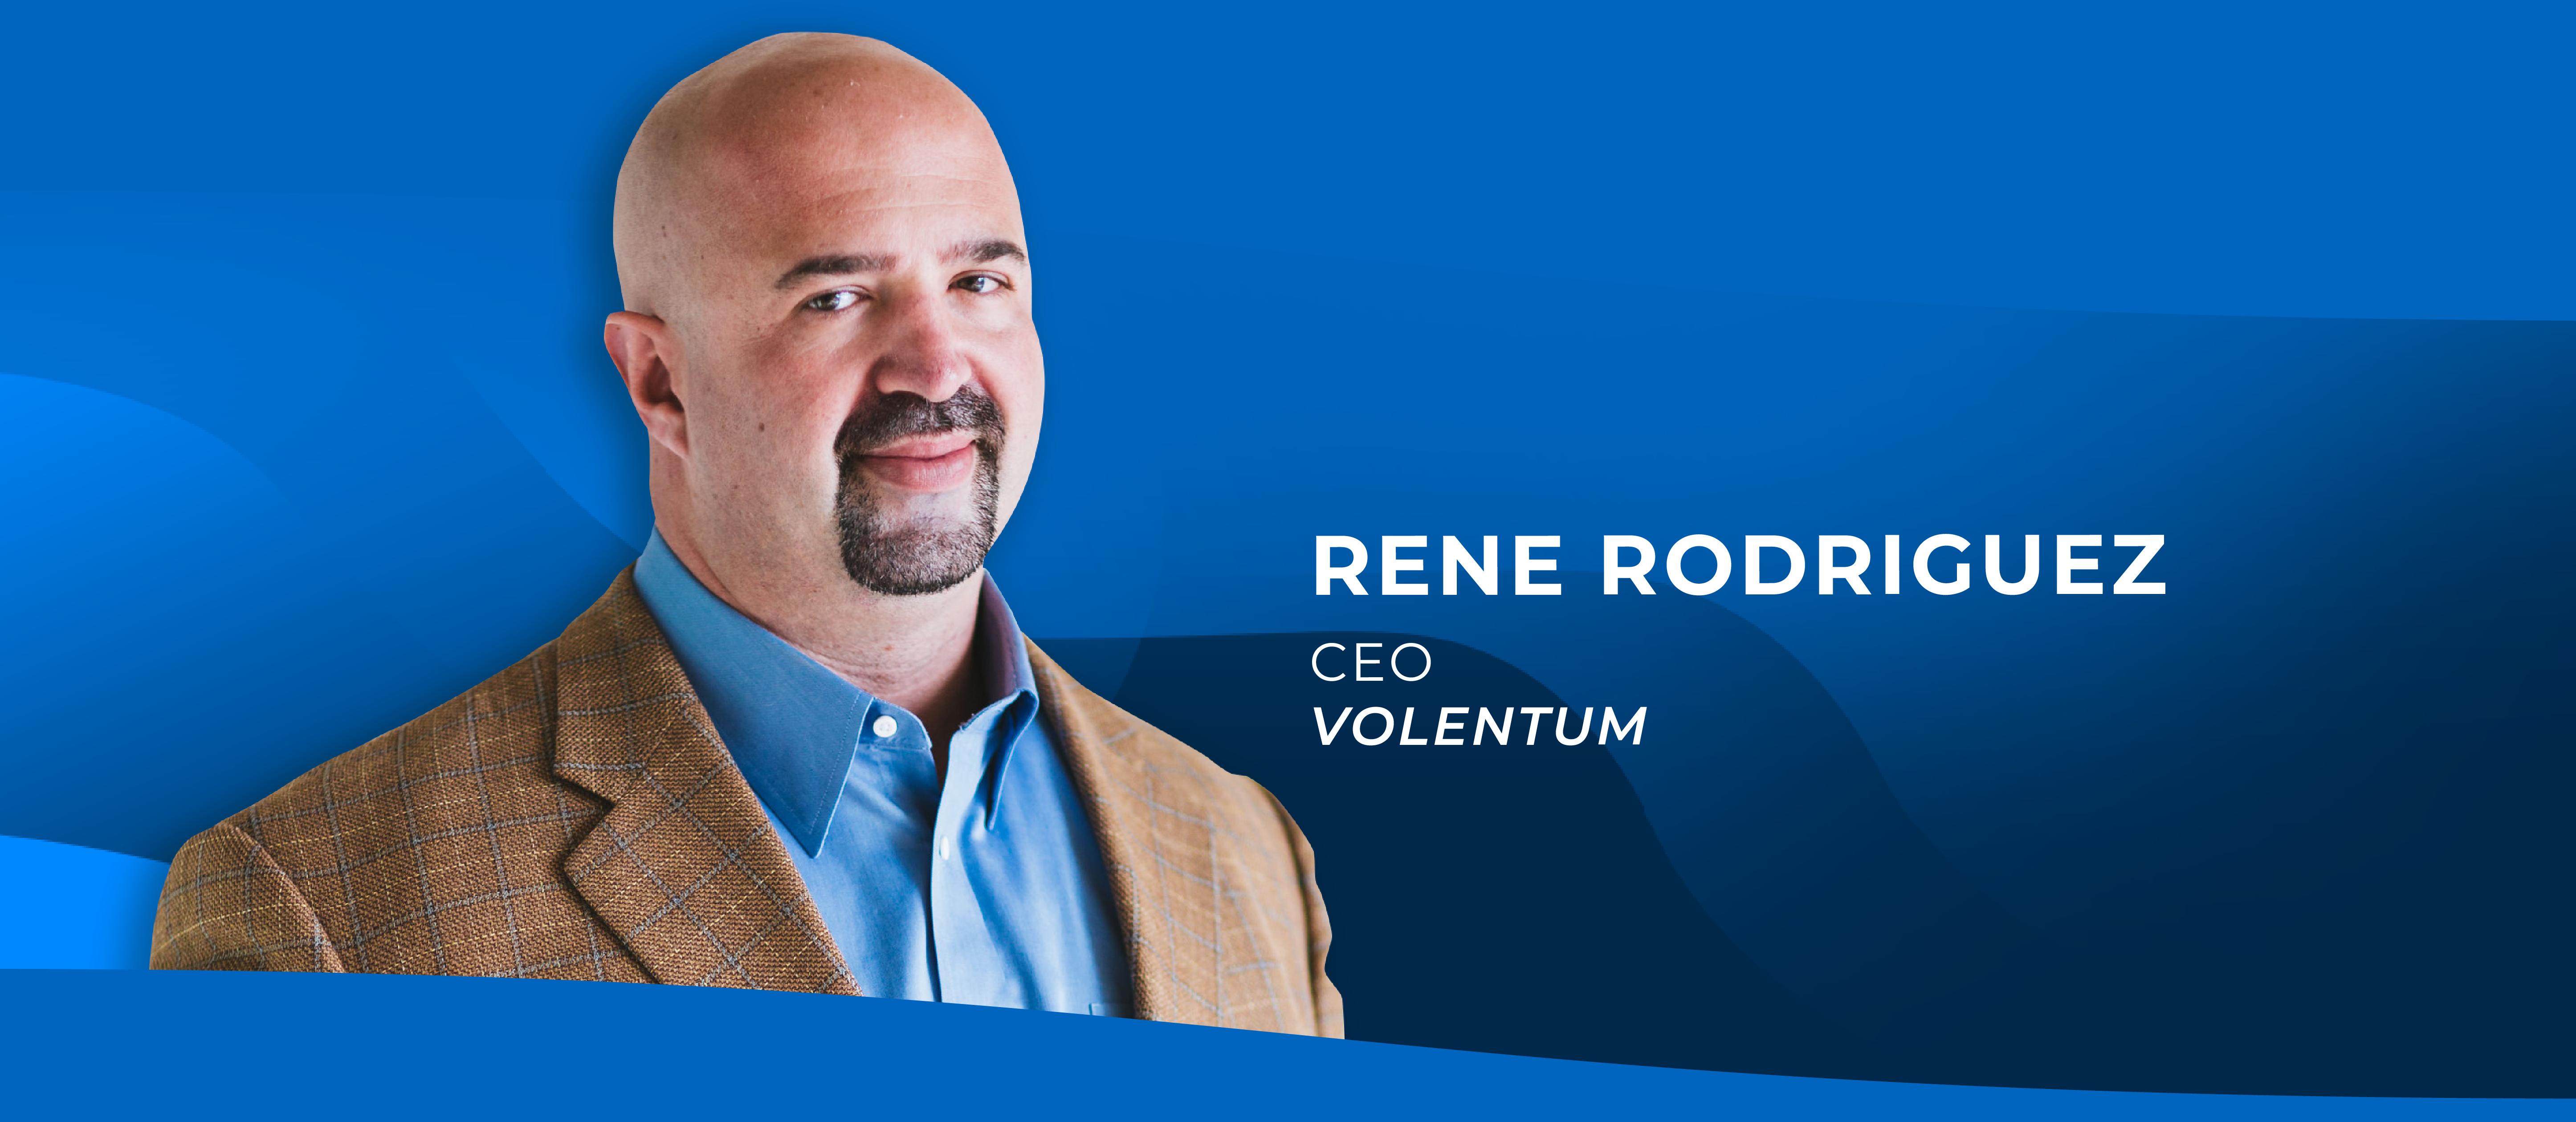 Rene Rodriguez. CEO of Volentum